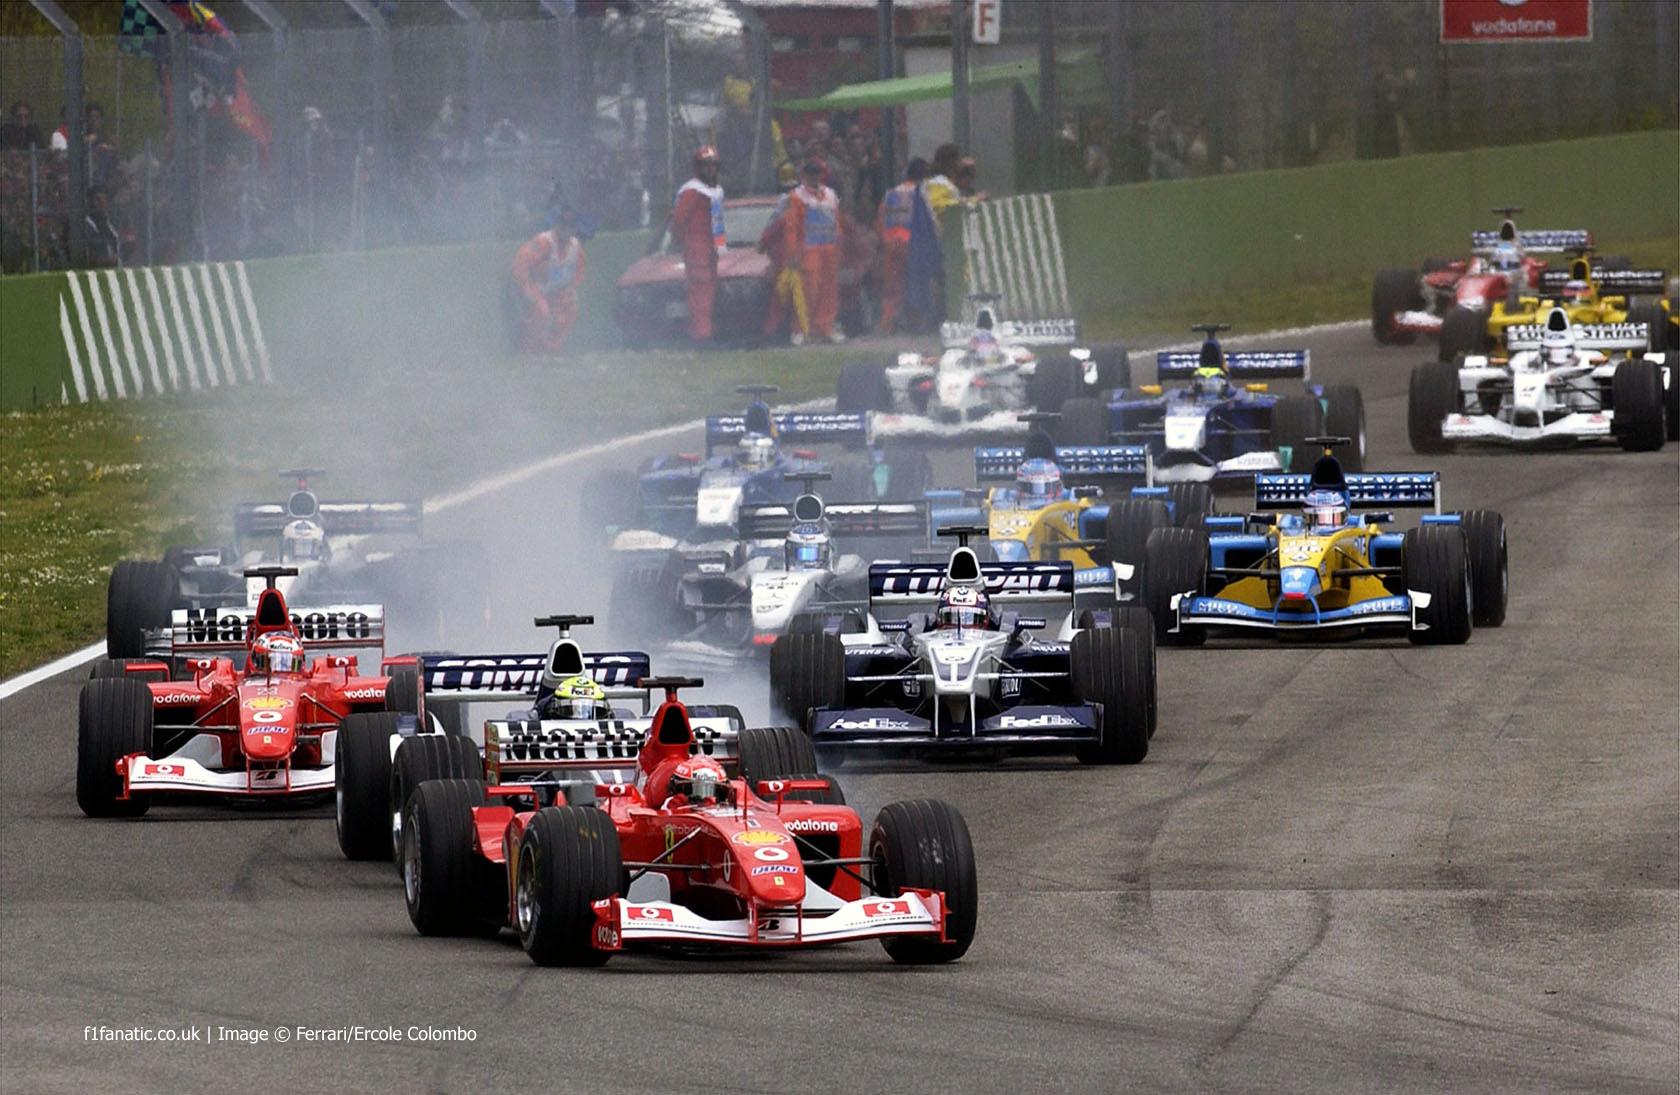 Michael Schumacher, Ferrari, Imola, 2002 · F1 Fanatic